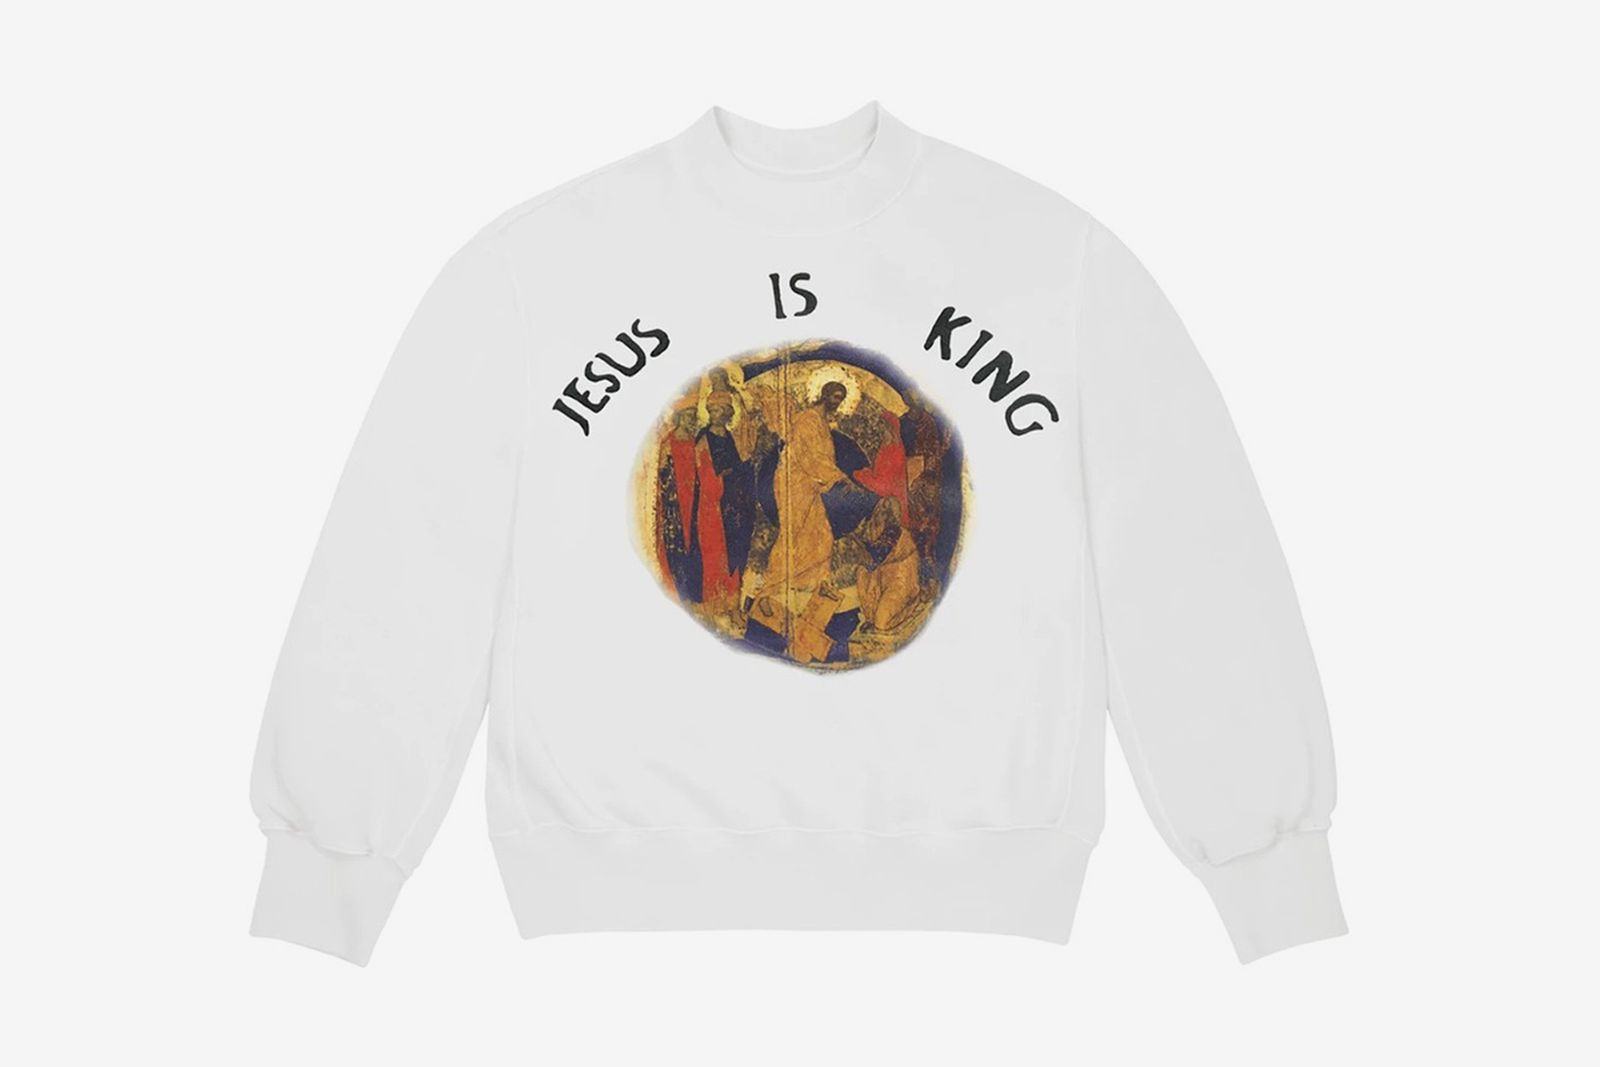 Kanye West Jesus Is King white crewneck sweatshirt